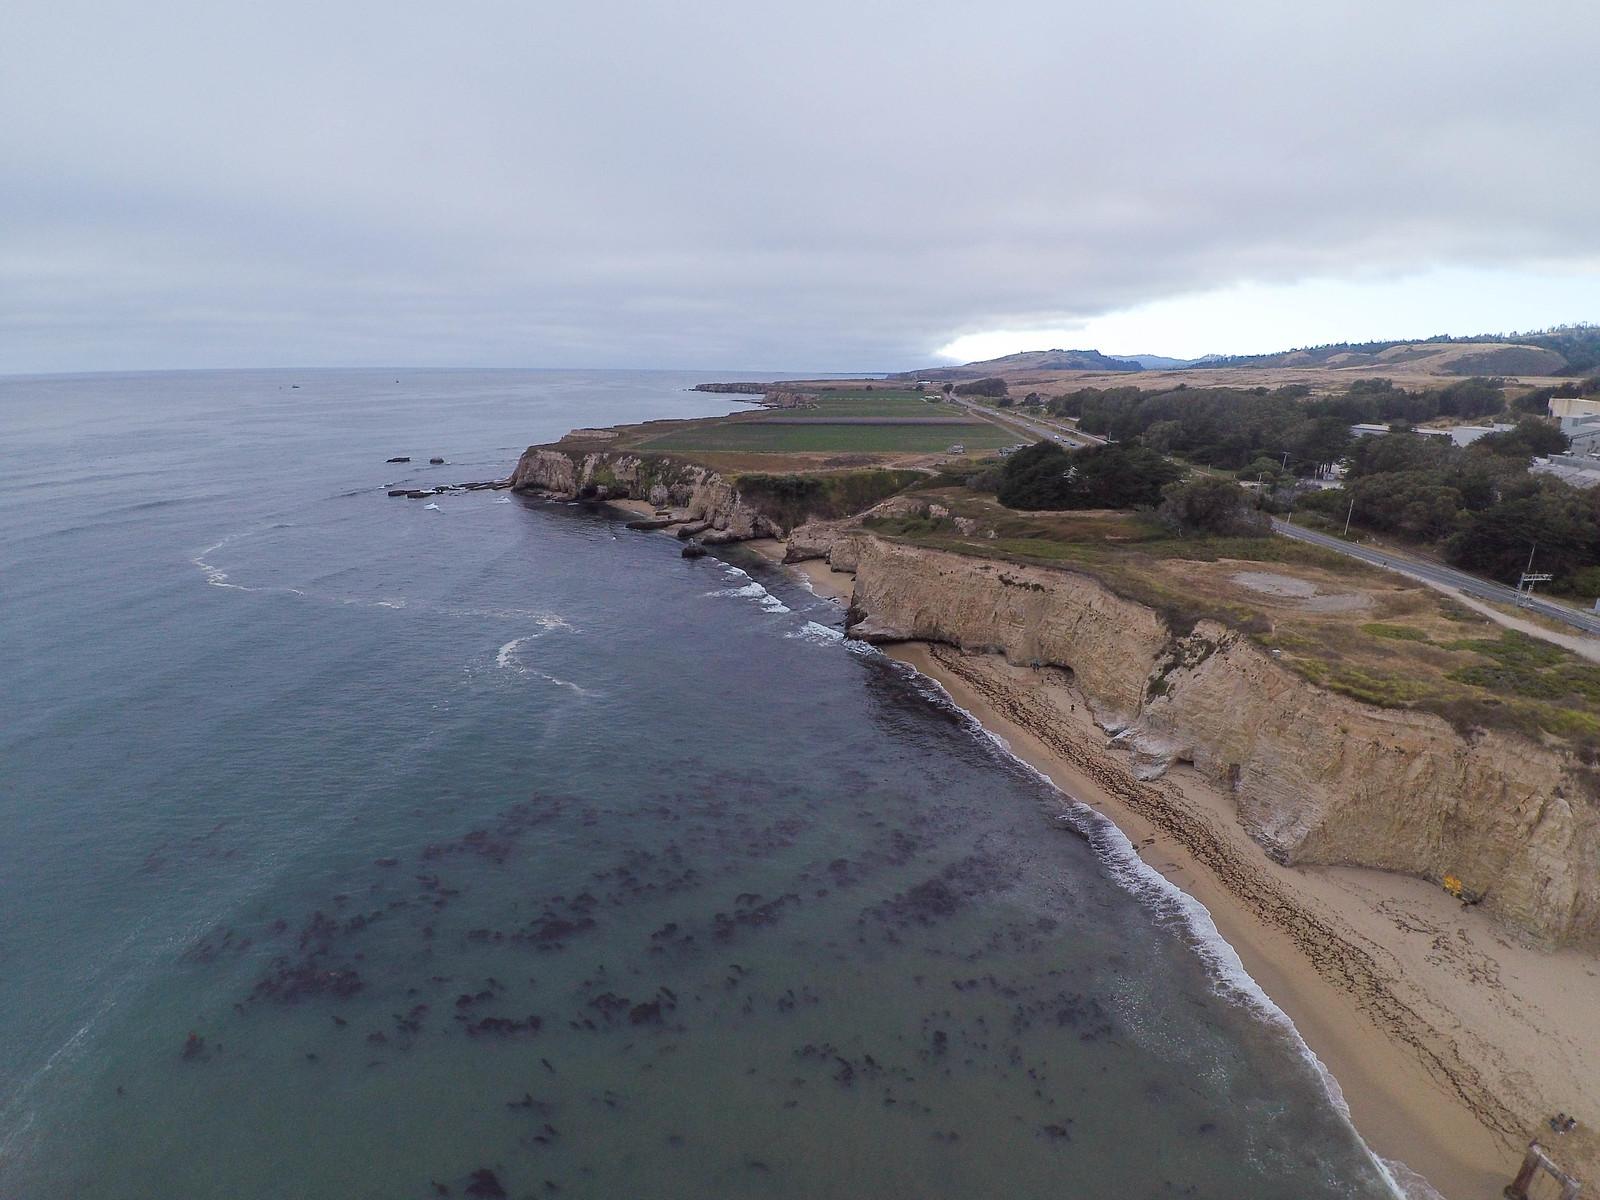 07.25. Drone: Davenport